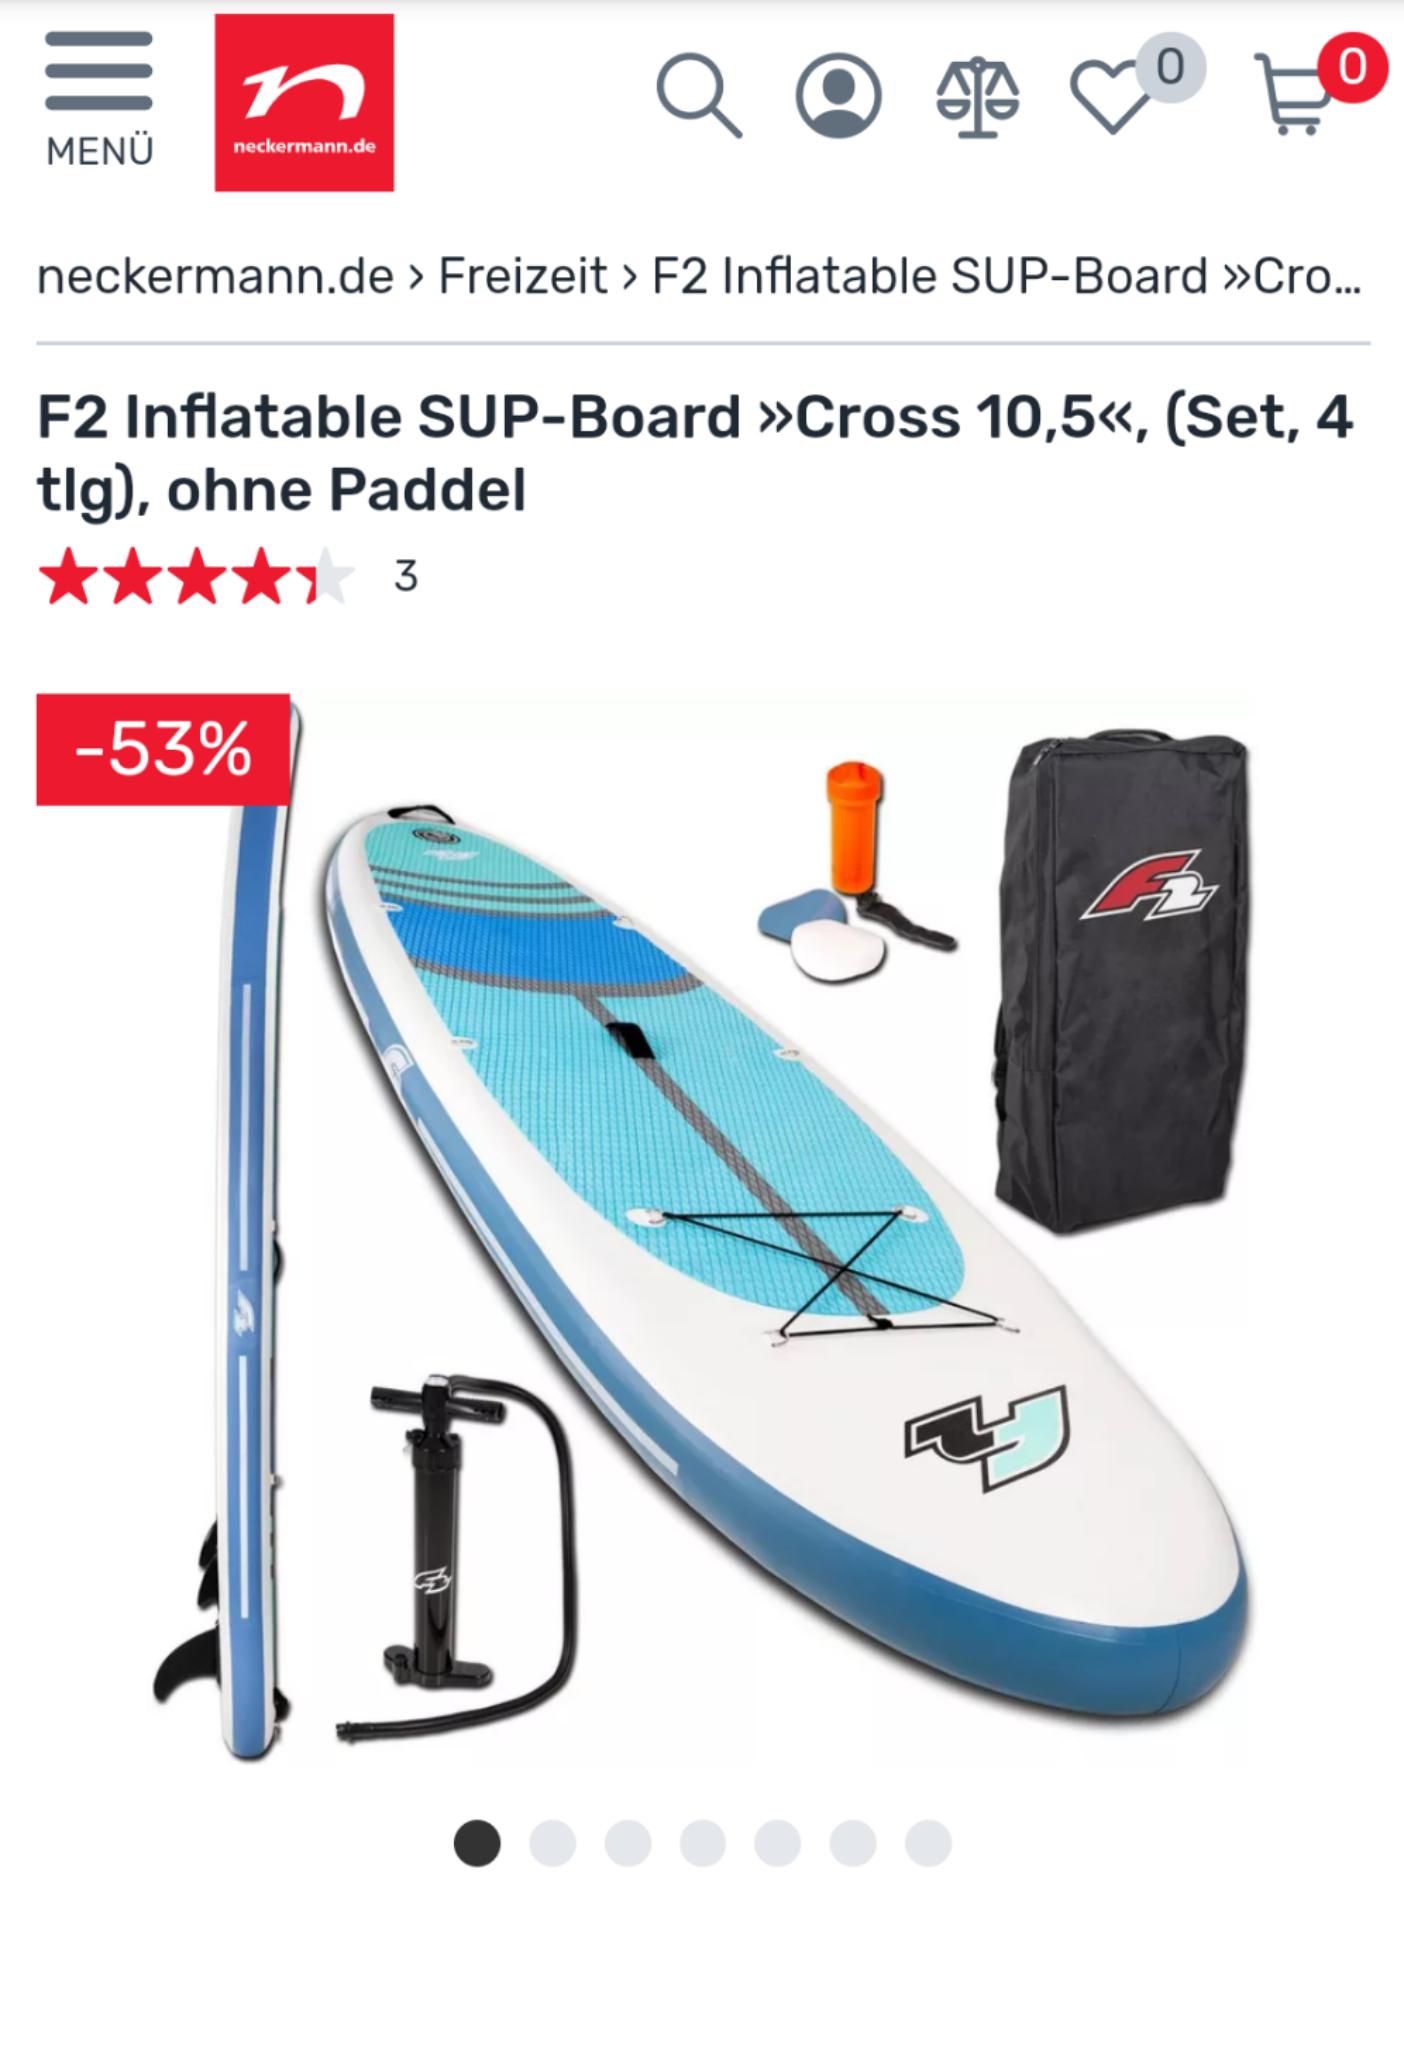 [Neckermann] F2 Inflatable SUP-Board »Cross 10,5«, (Set, 4 tlg) 206 € (Neukunden, sonst +5.95€ Versand), manchmal mit Paddel